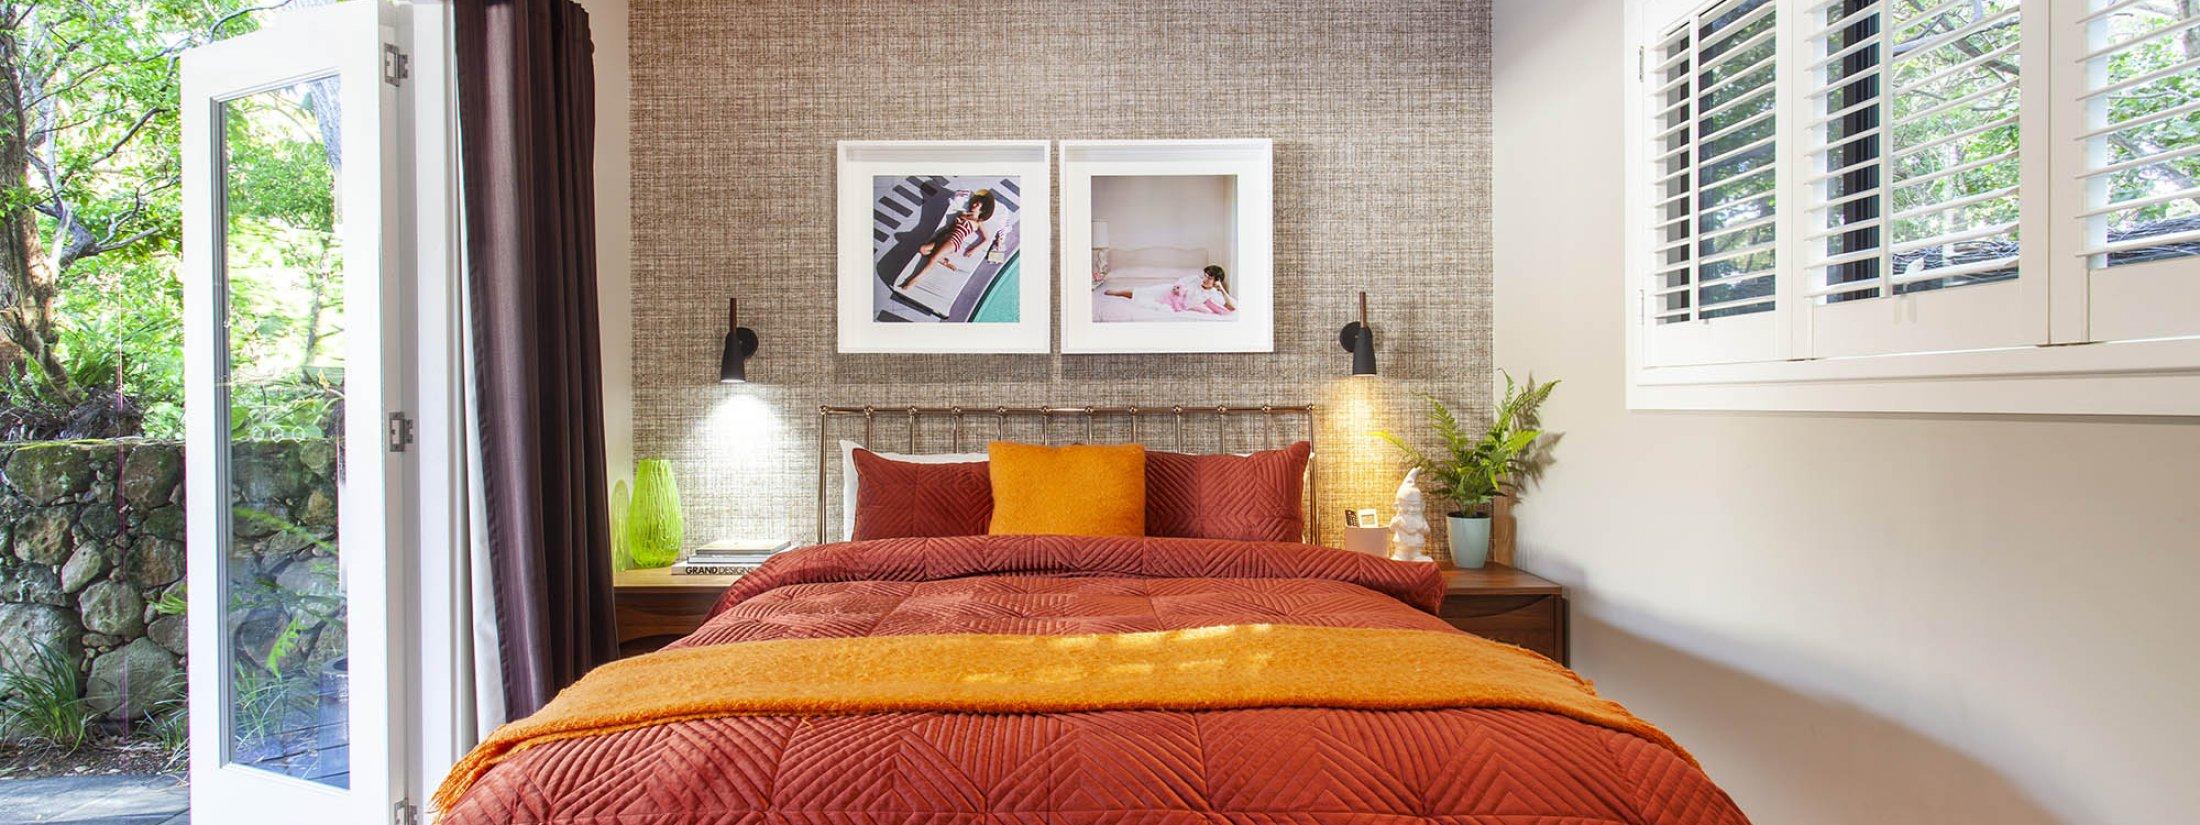 The Palms at Byron - Byron Bay - Bedroom 3f